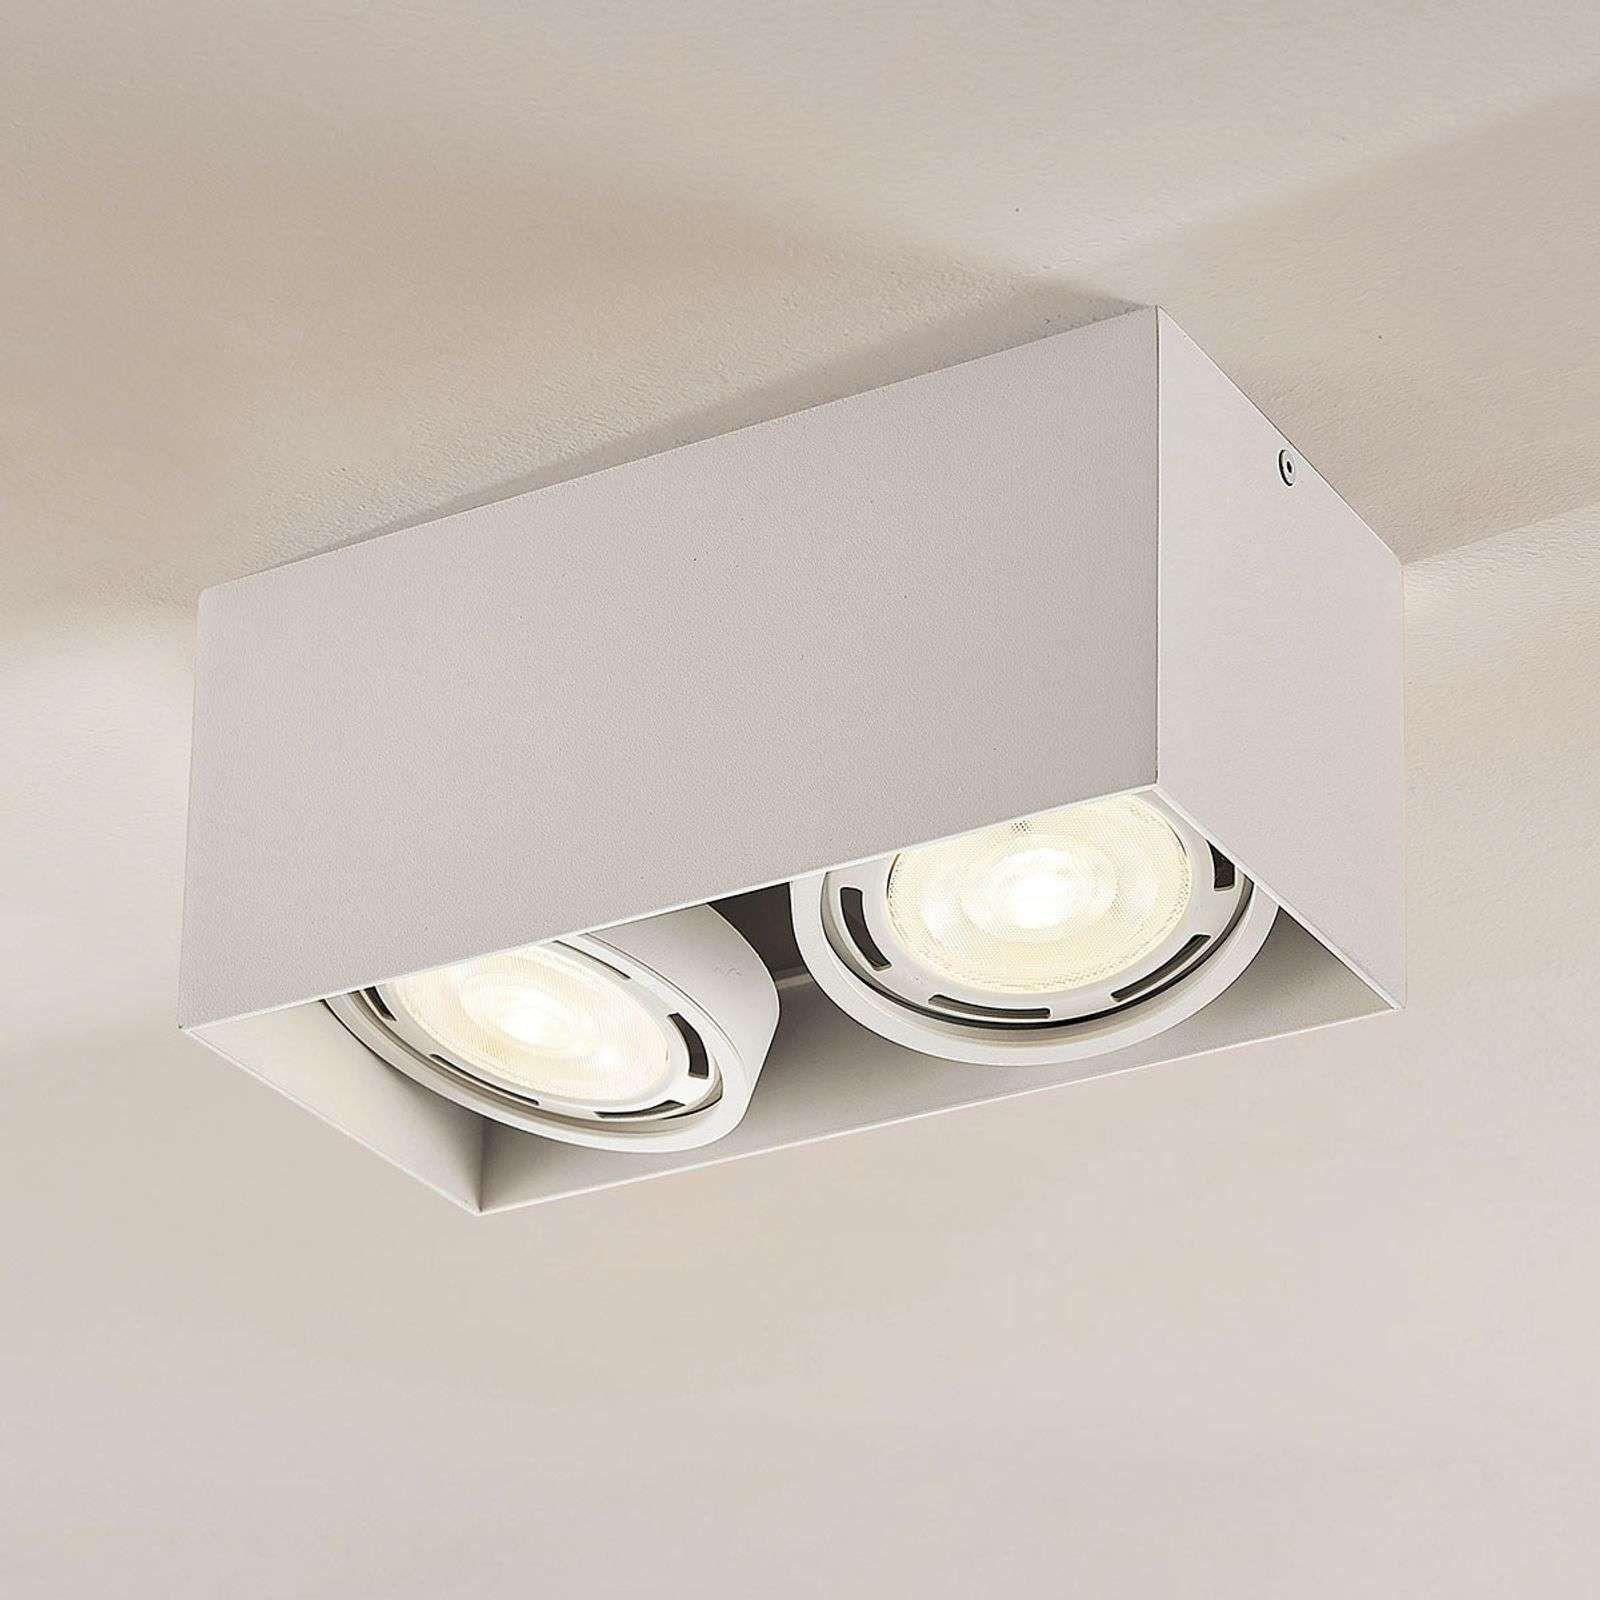 Led Downlight Rosalie Dimbaar Hoekig 2 Lamps Wit Led Verlichting Binnenverlichting